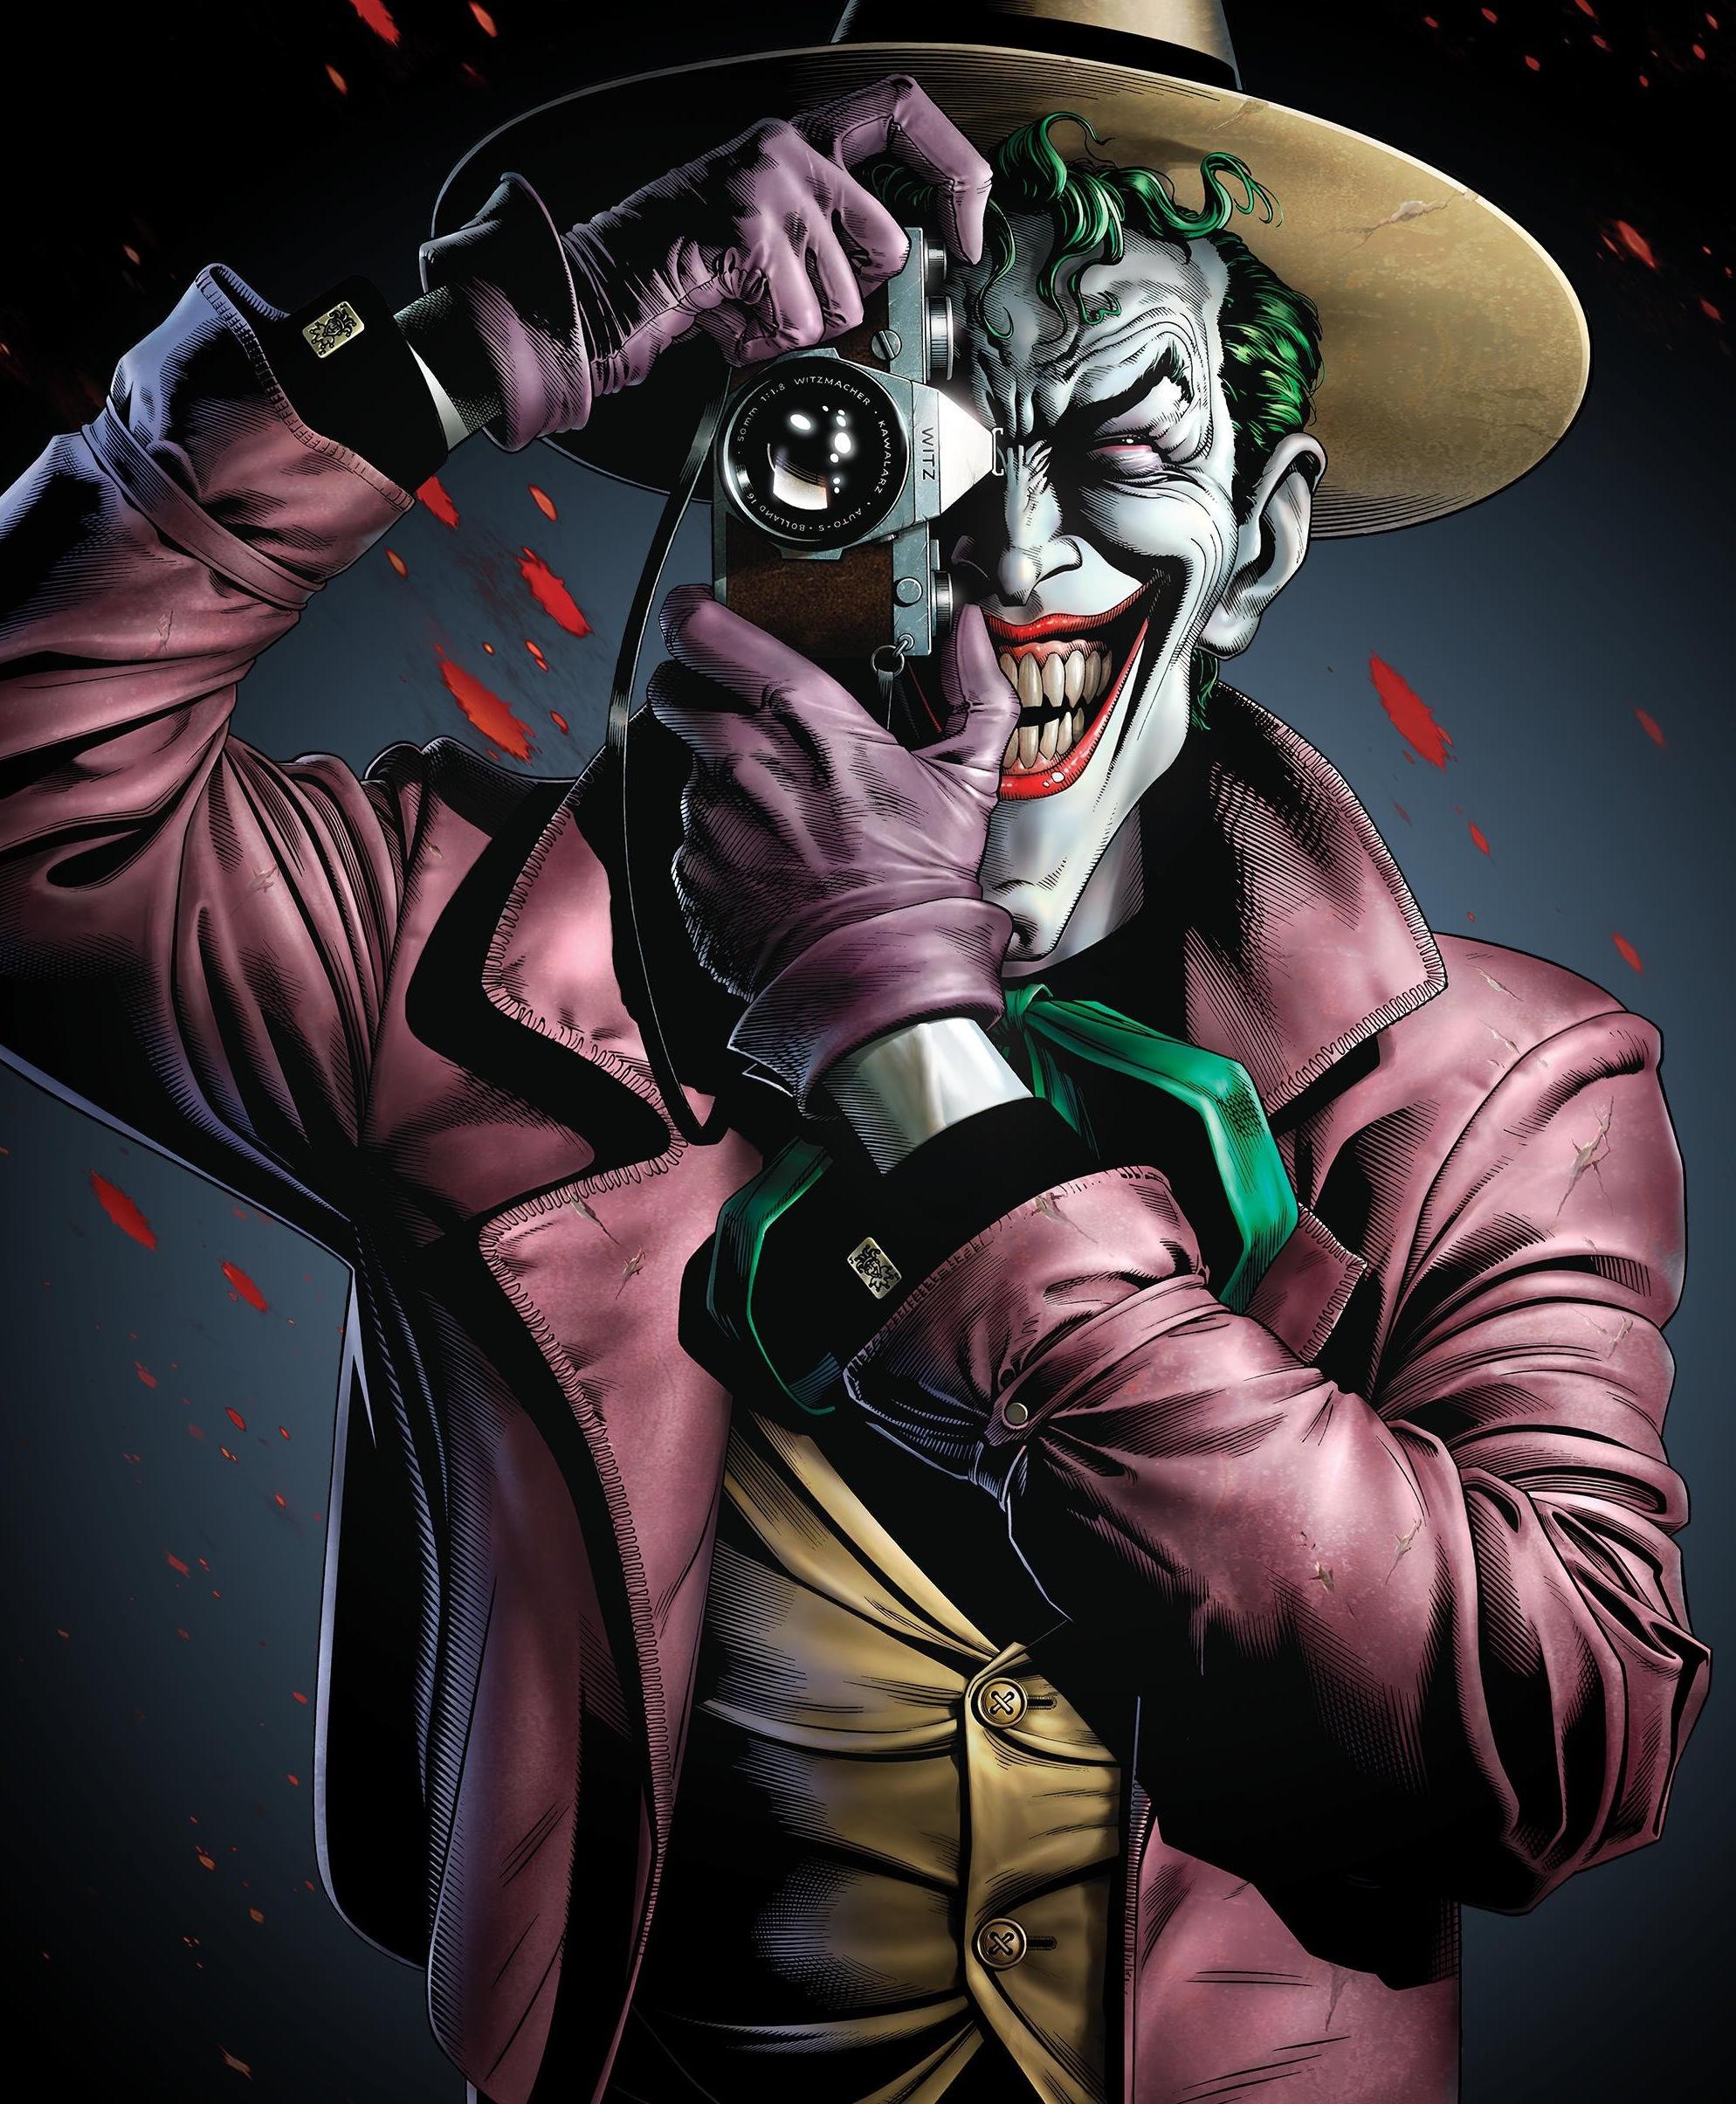 0031865d77c62 Batman - The Killing Joke - Poster - Portrait format - 61 x cm The well  known super villain grins at you from the Batman